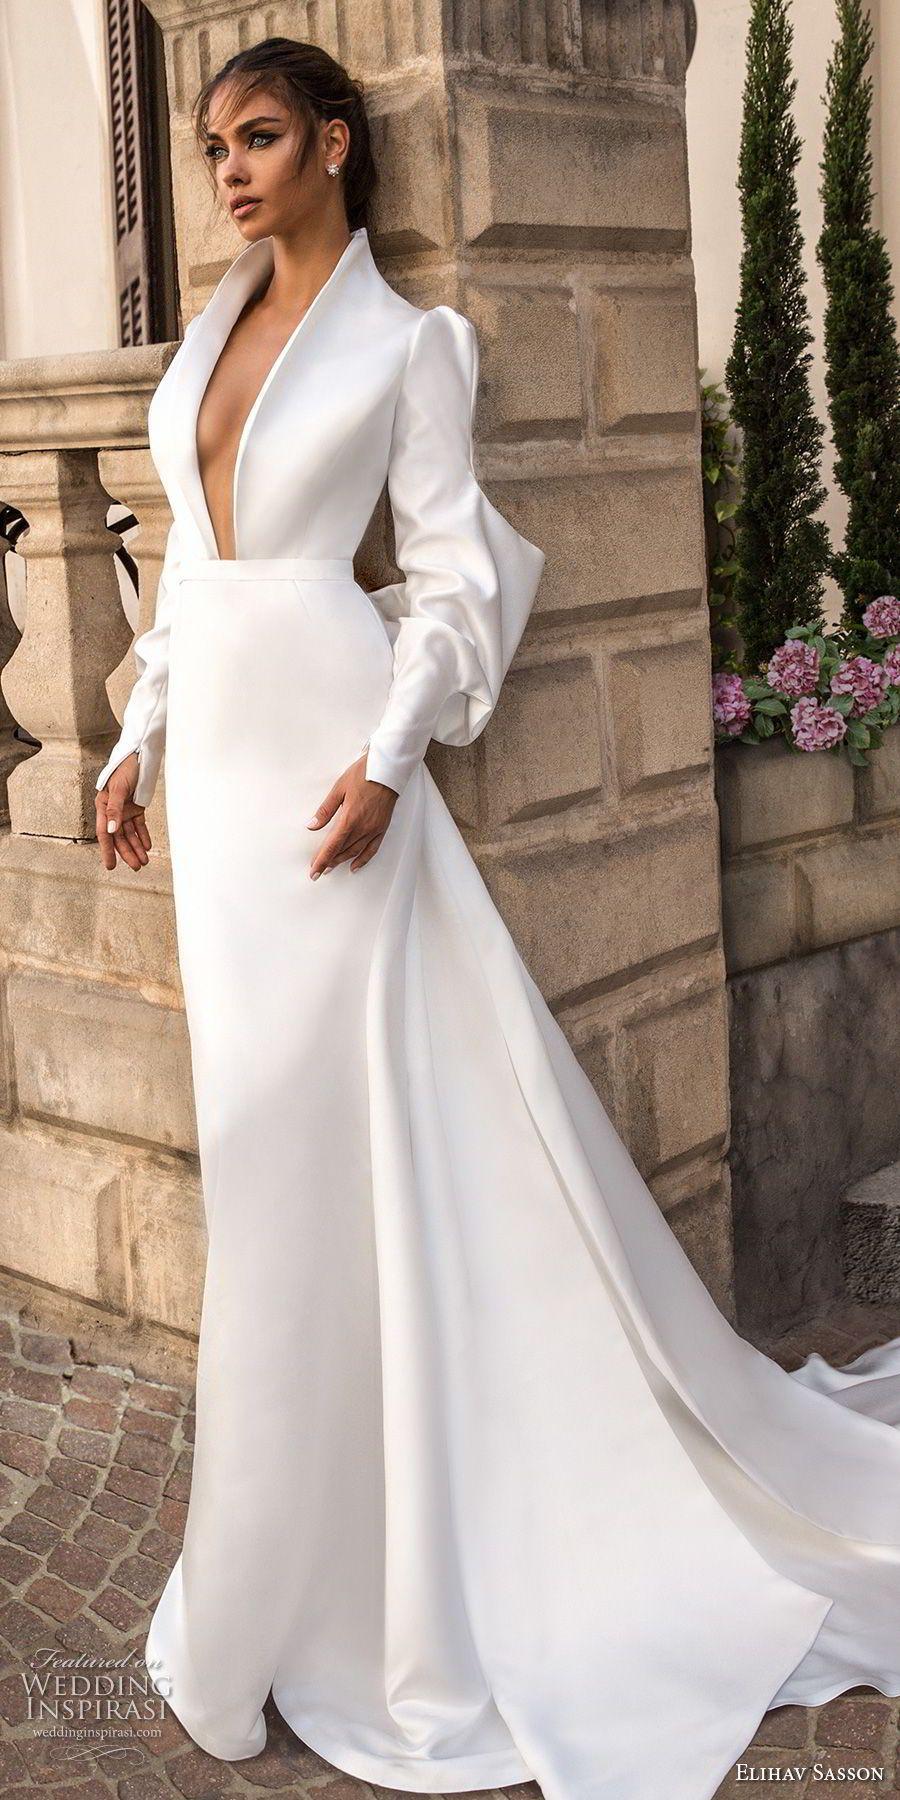 Steampunk wedding dresses  Elihav Sasson  Royalty Girl Capsule Collection  Šaty Svatba a